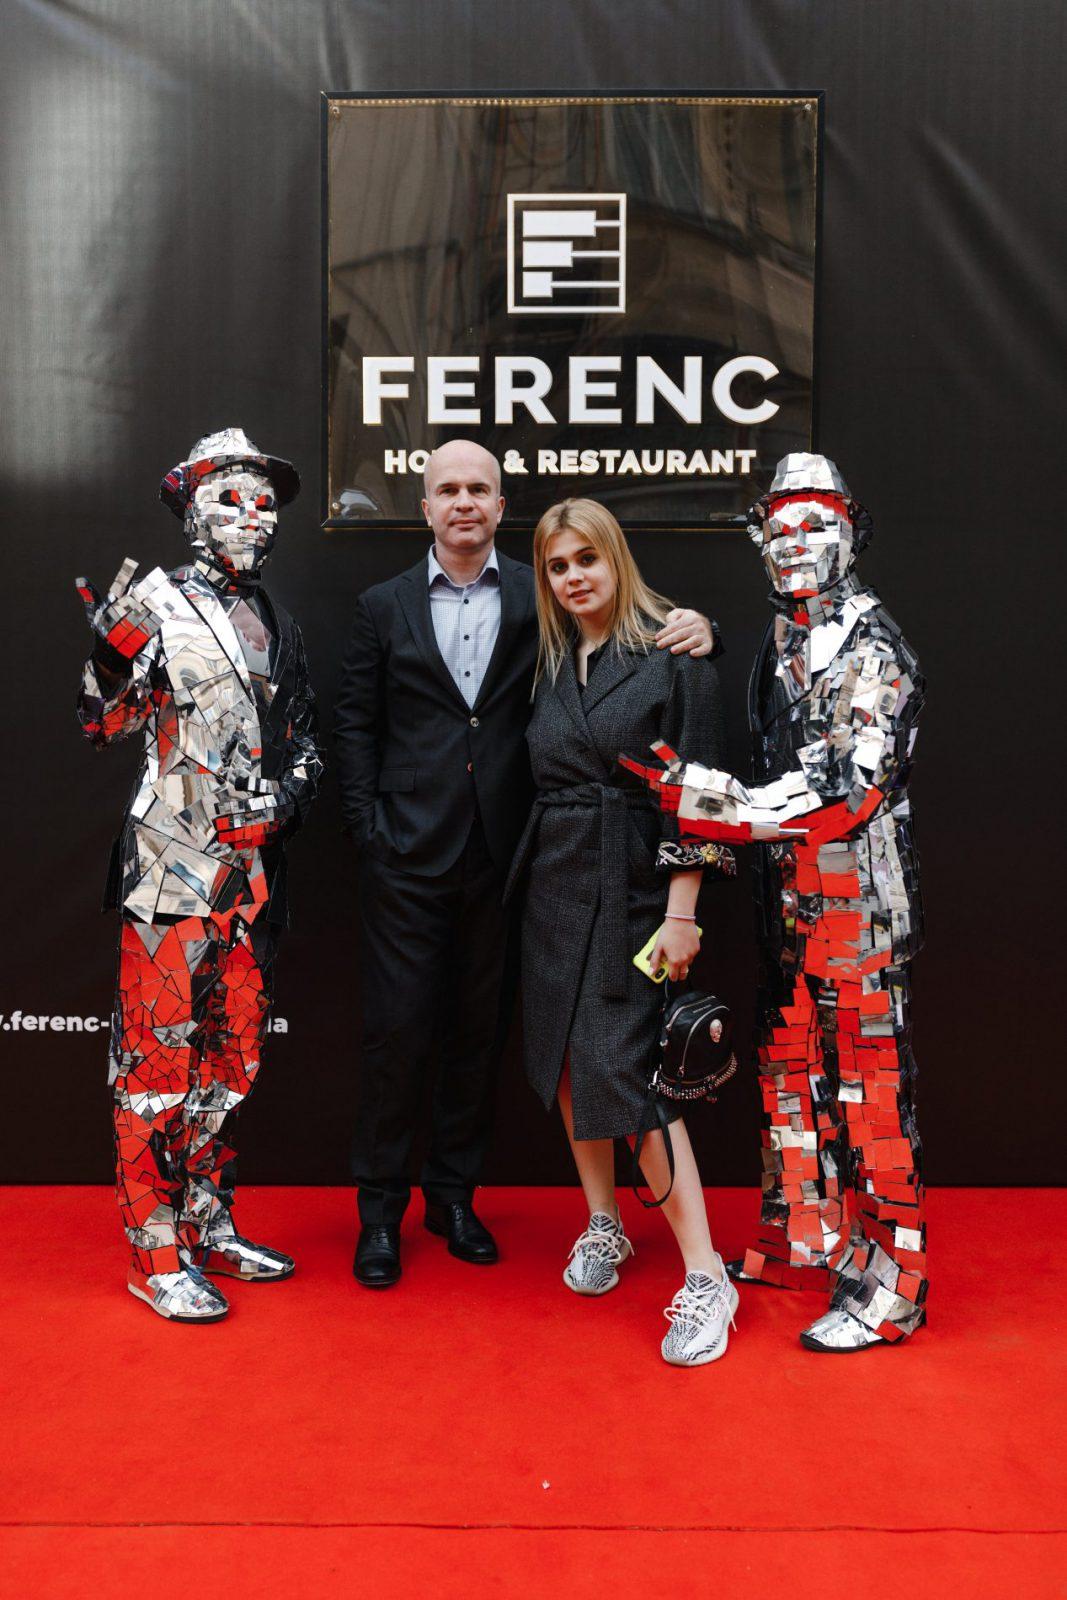 Ferenc0077